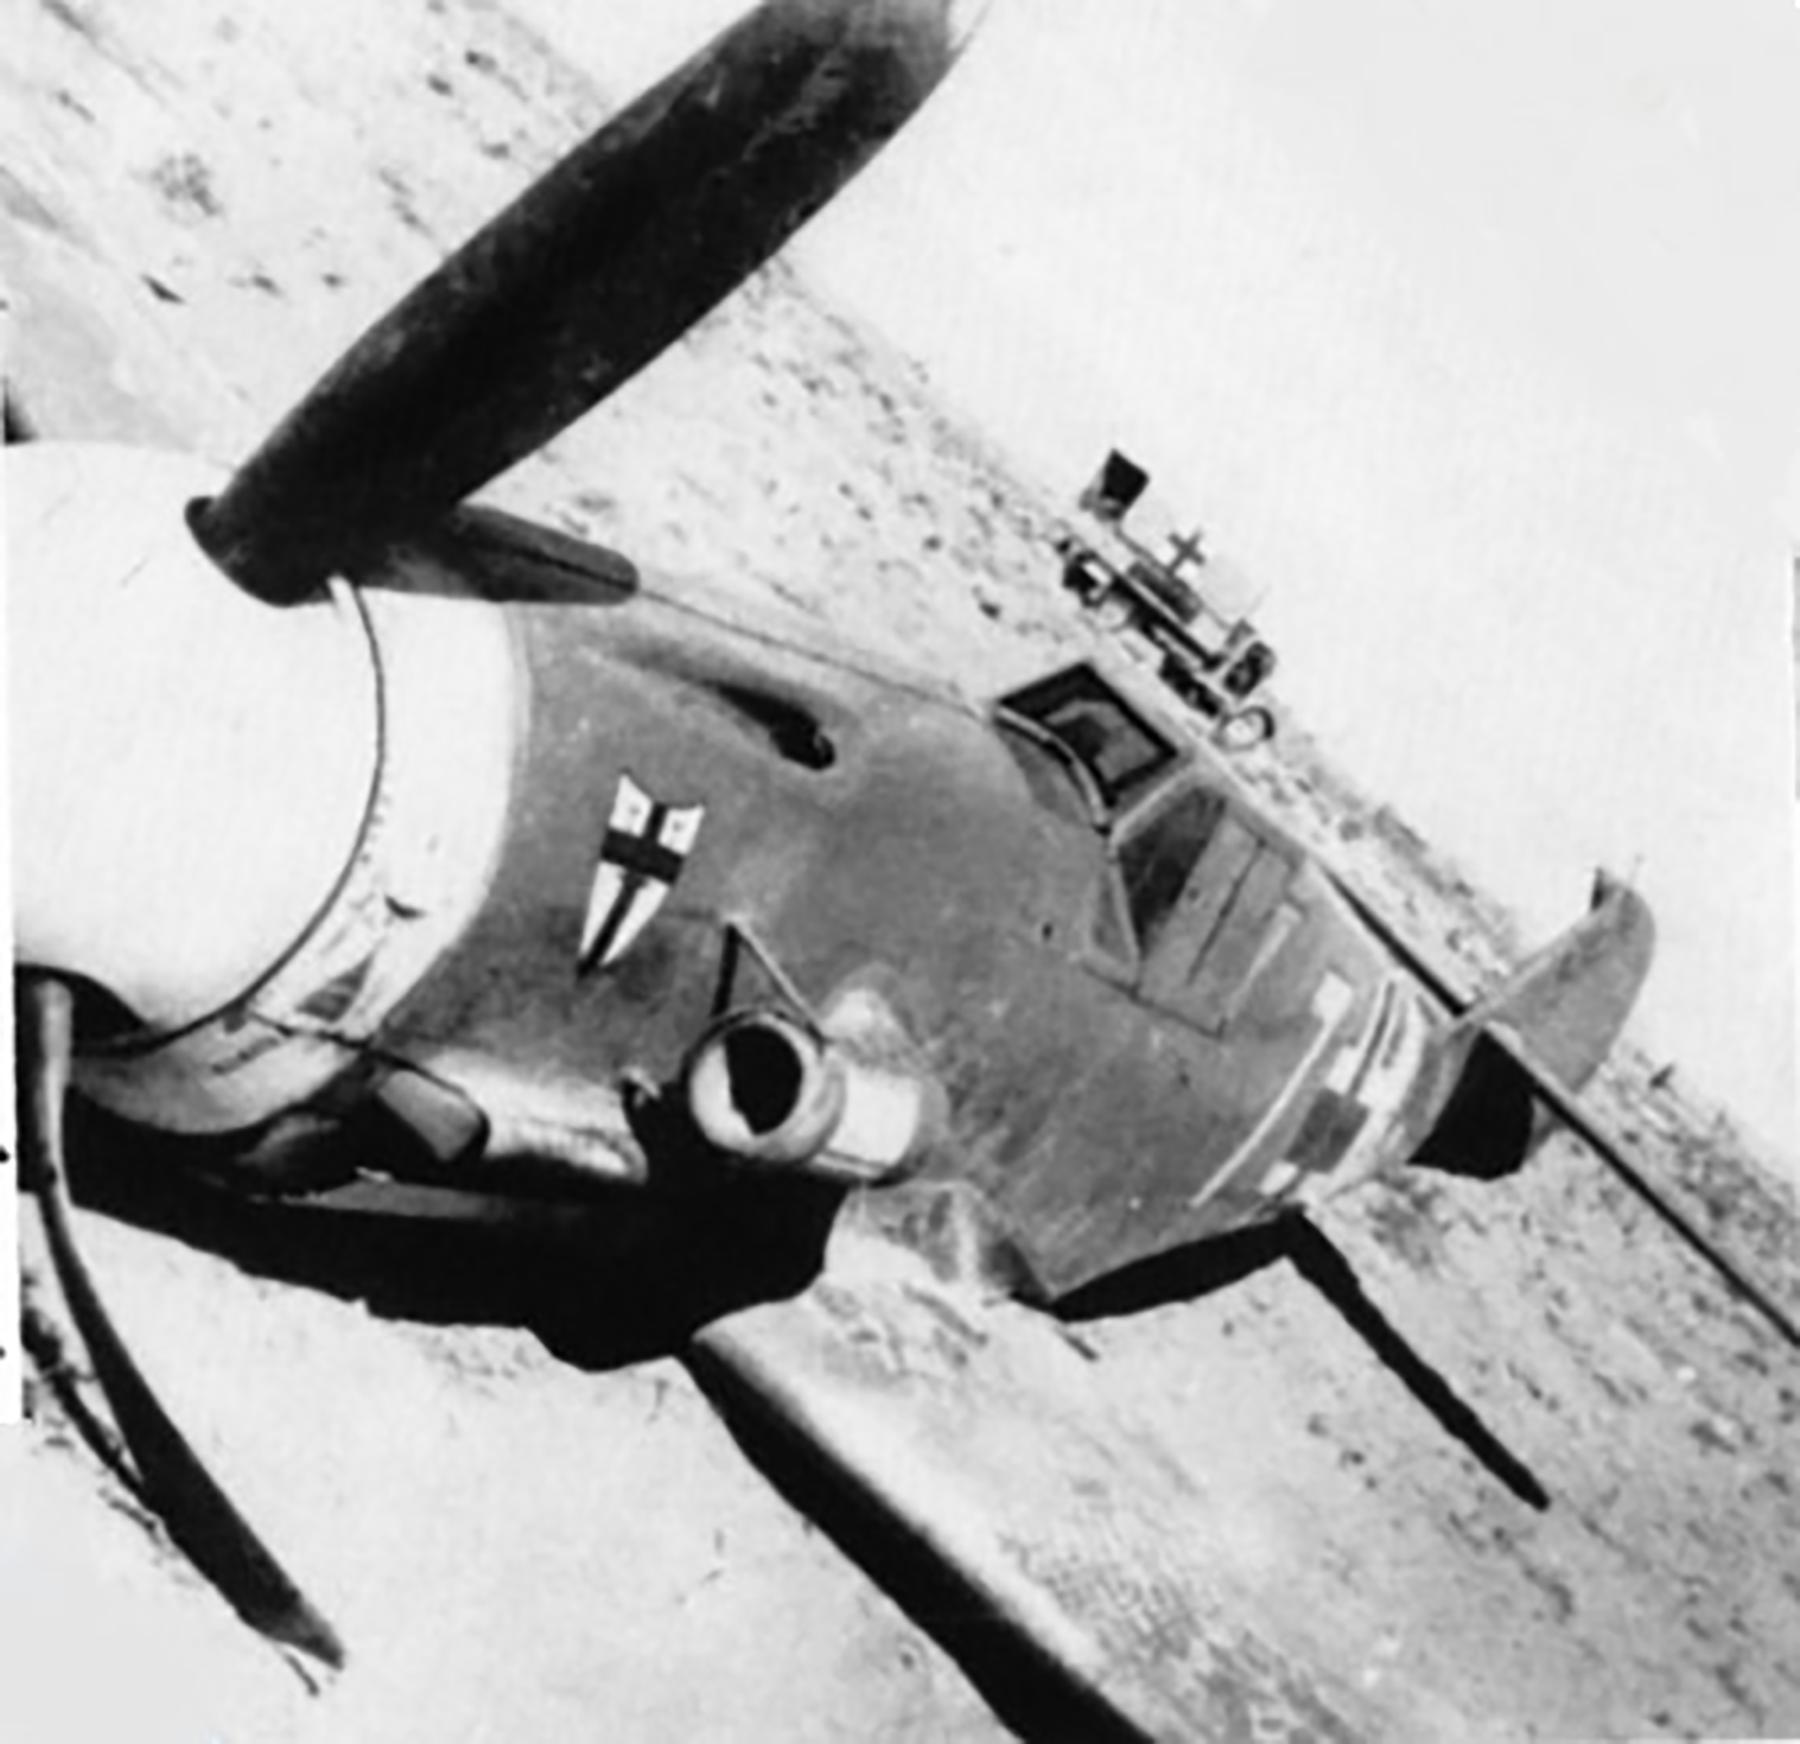 Messerschmitt Bf 109F4Trop 9.JG27 Yellow 7 Helmuth Fenzl WNr 13136 crash Egypt 26th Oct 1942 04